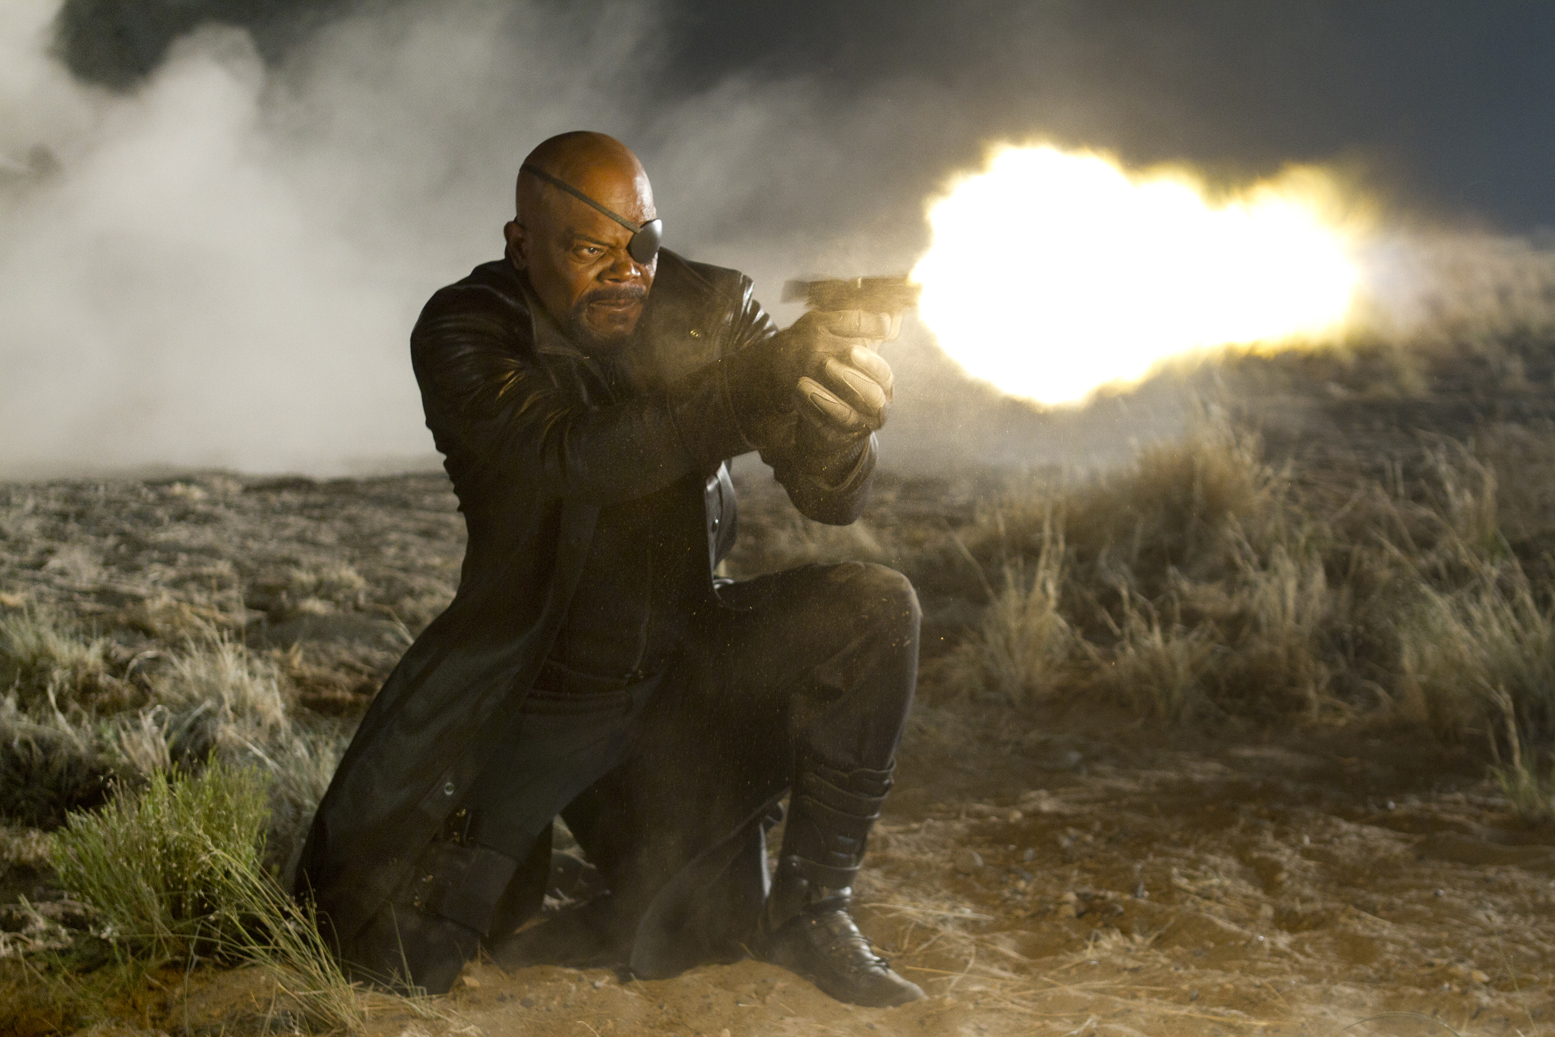 http://2.bp.blogspot.com/-cEKzPJRy57Q/TopGK9bmXII/AAAAAAAADjs/POnQc5AhVdU/s1600/avengers-movie-image-samuel-l-jackson-01.jpg